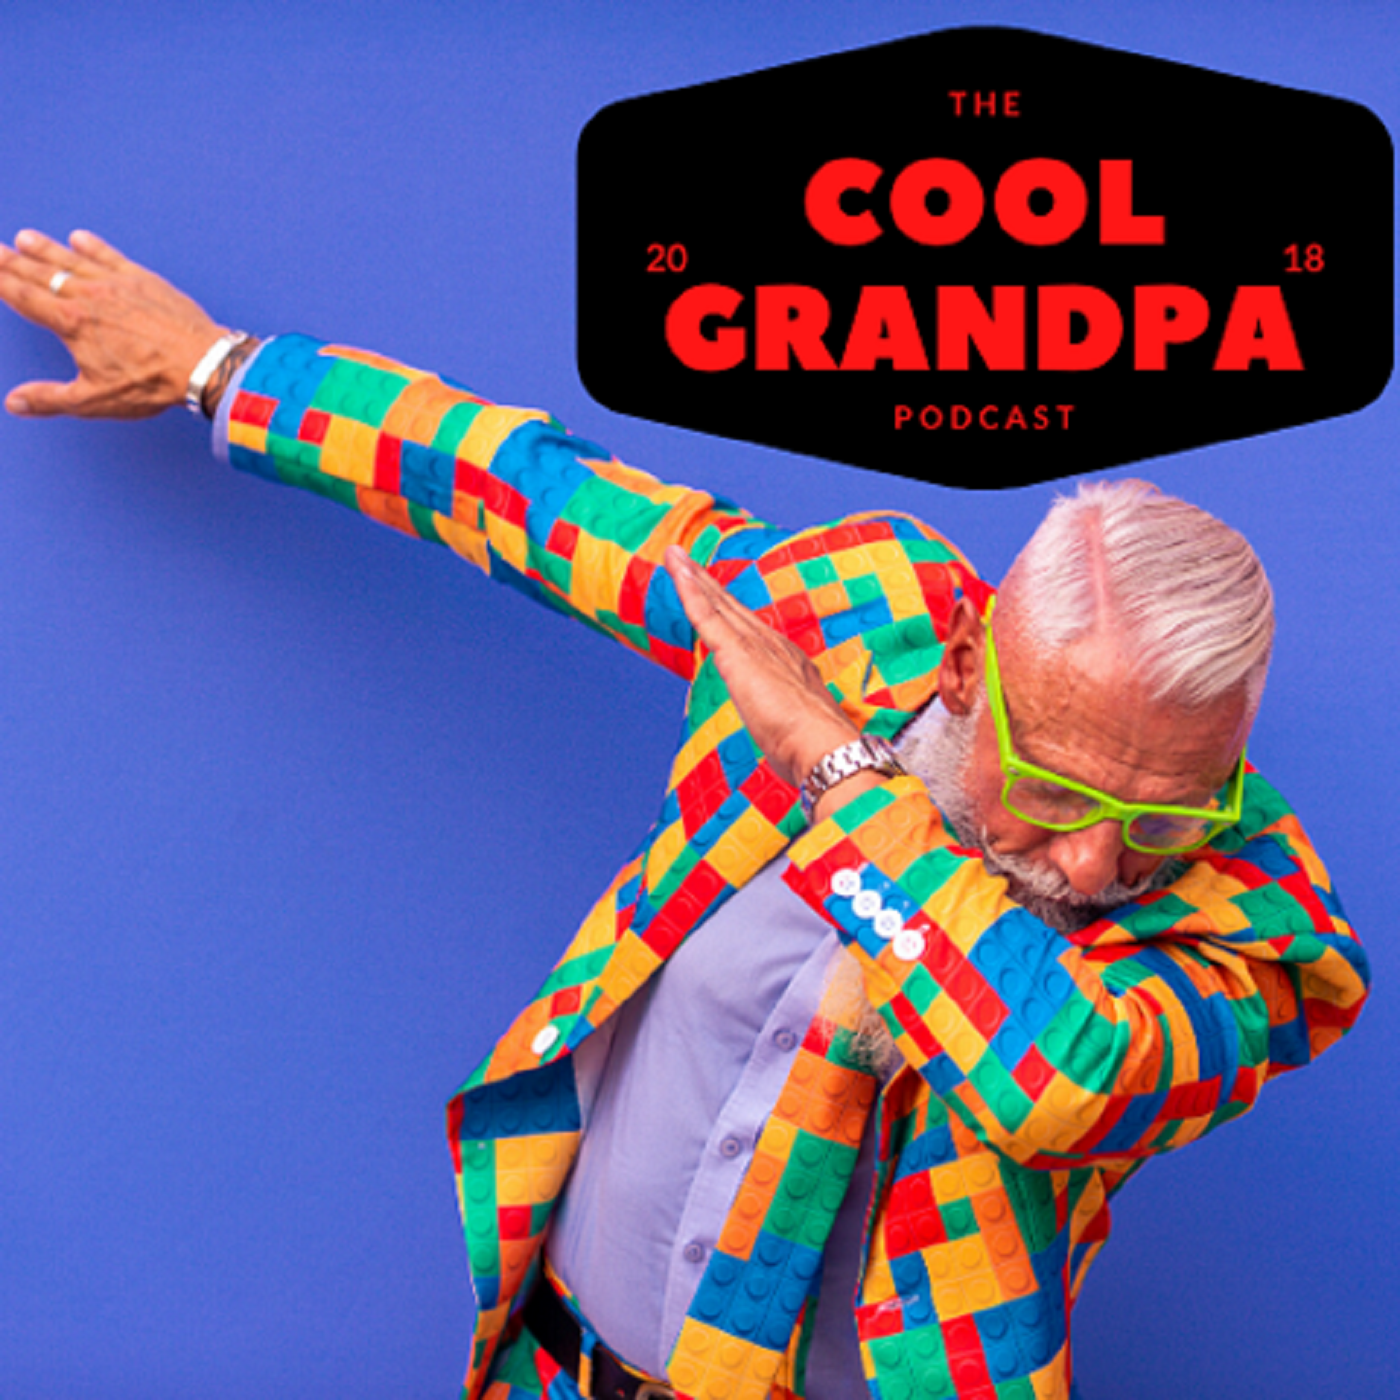 The Cool Grandpa Podcast show art